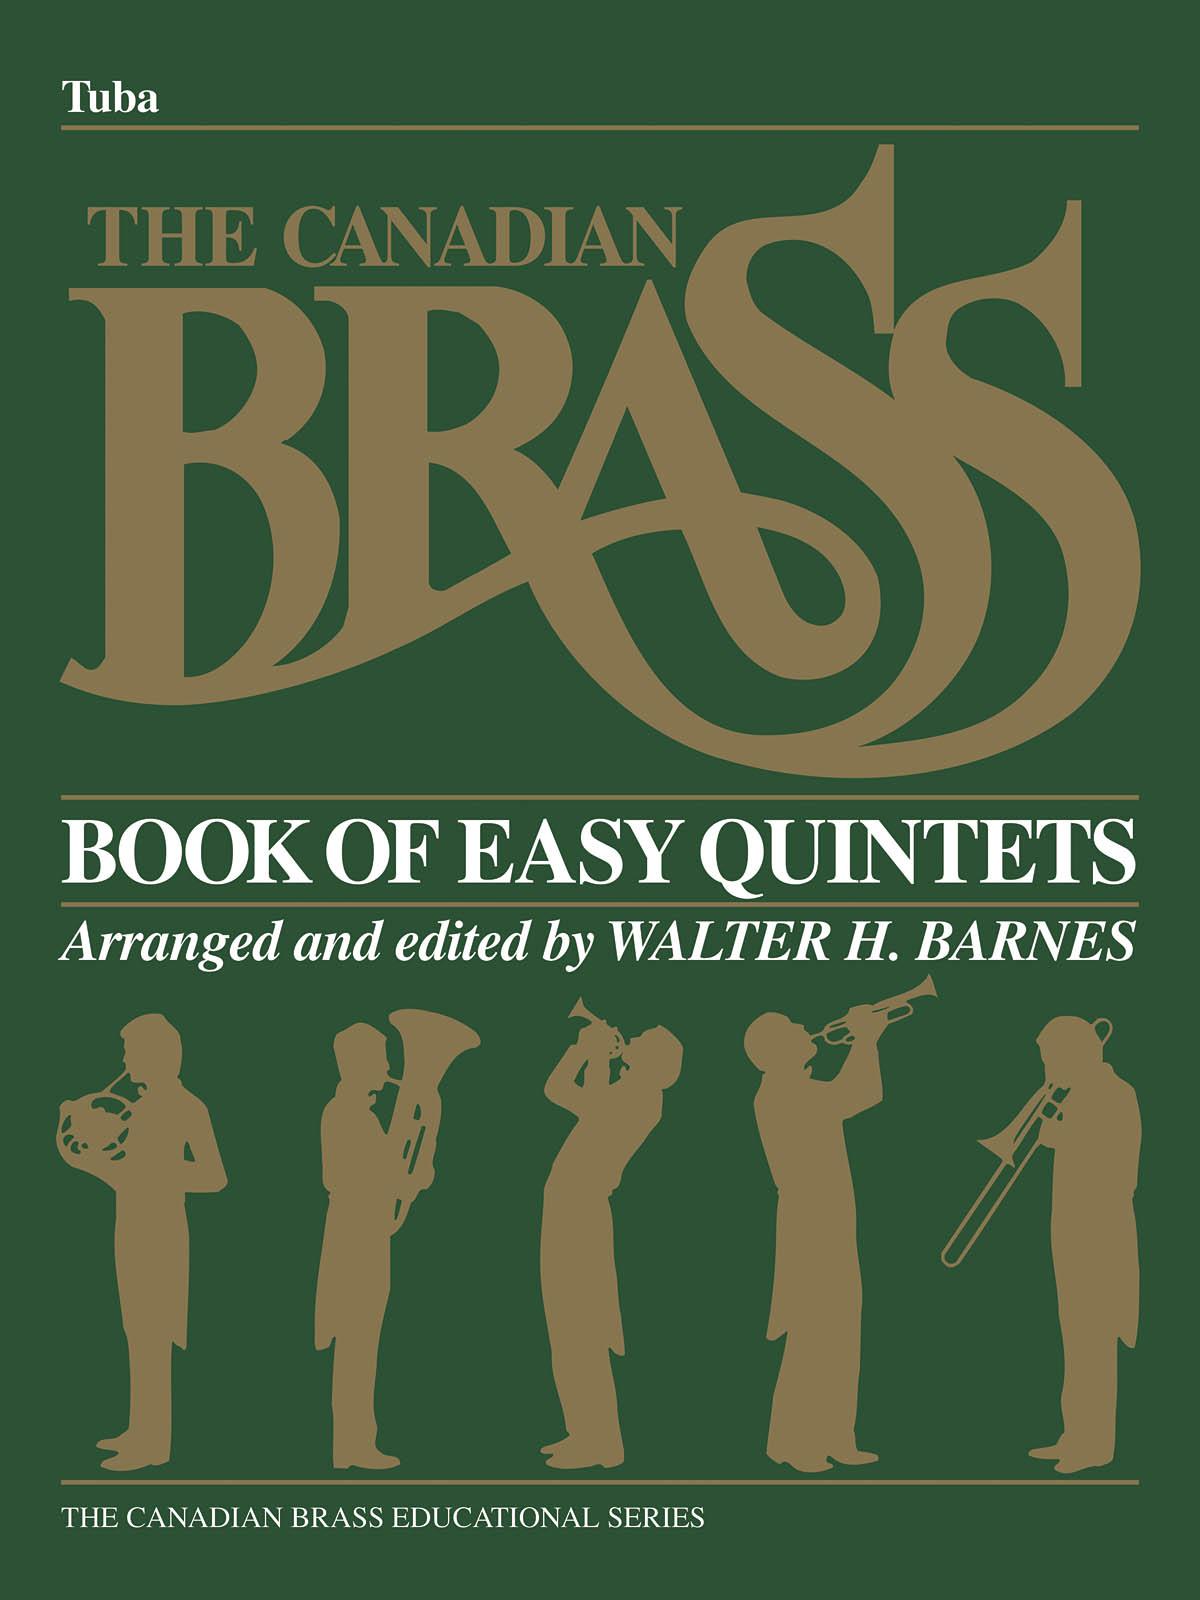 The Canadian Brass: The Canadian Brass Book of Beginning Quintets: Brass